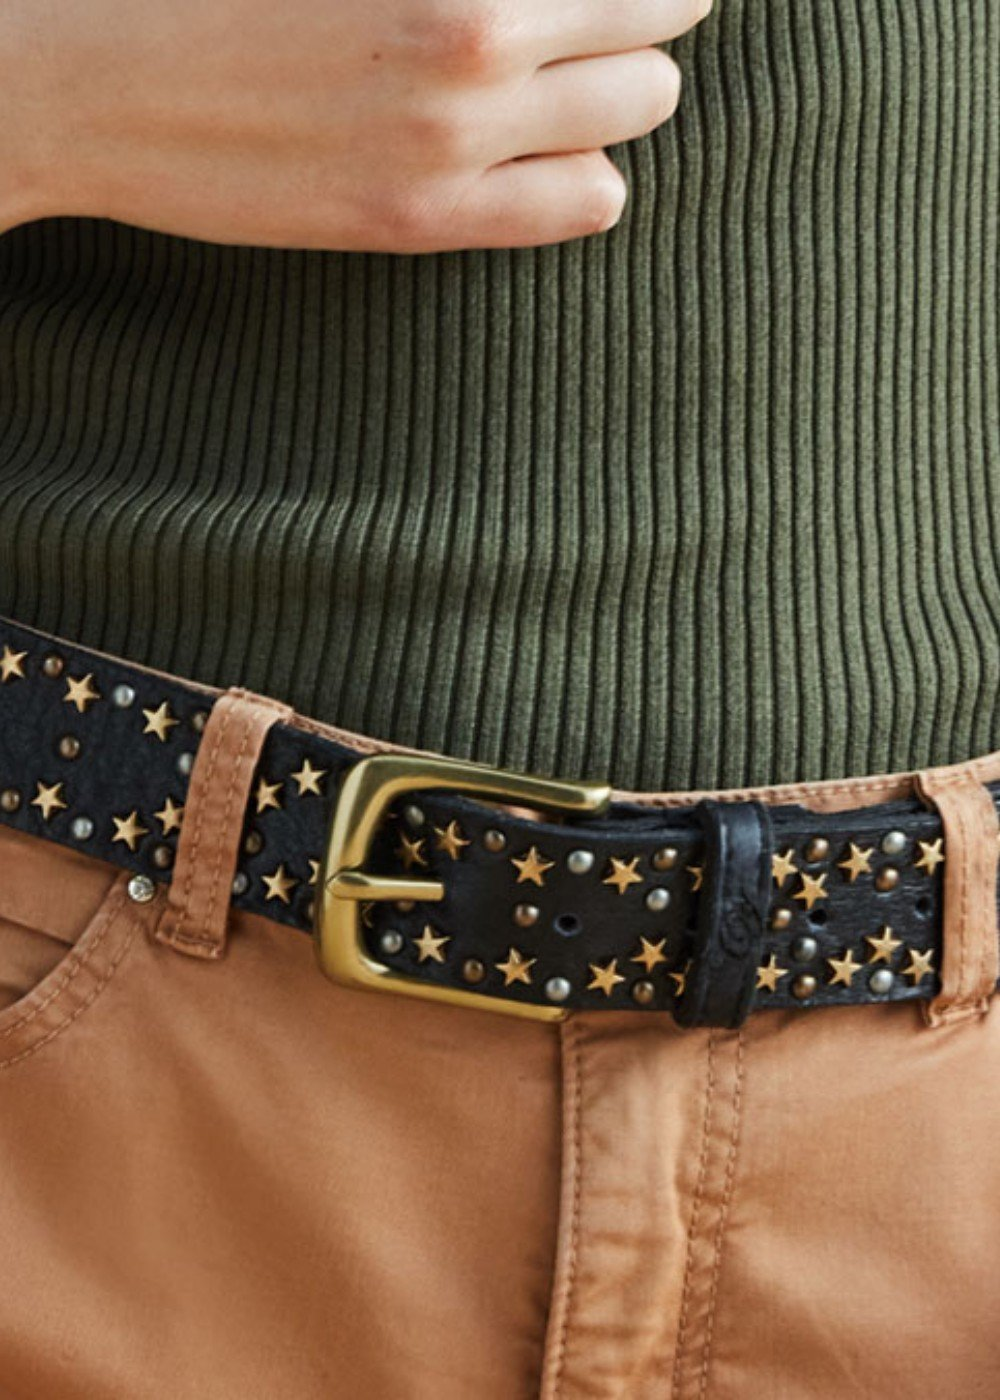 Cintura Camy in vera pelle - Black - Donna